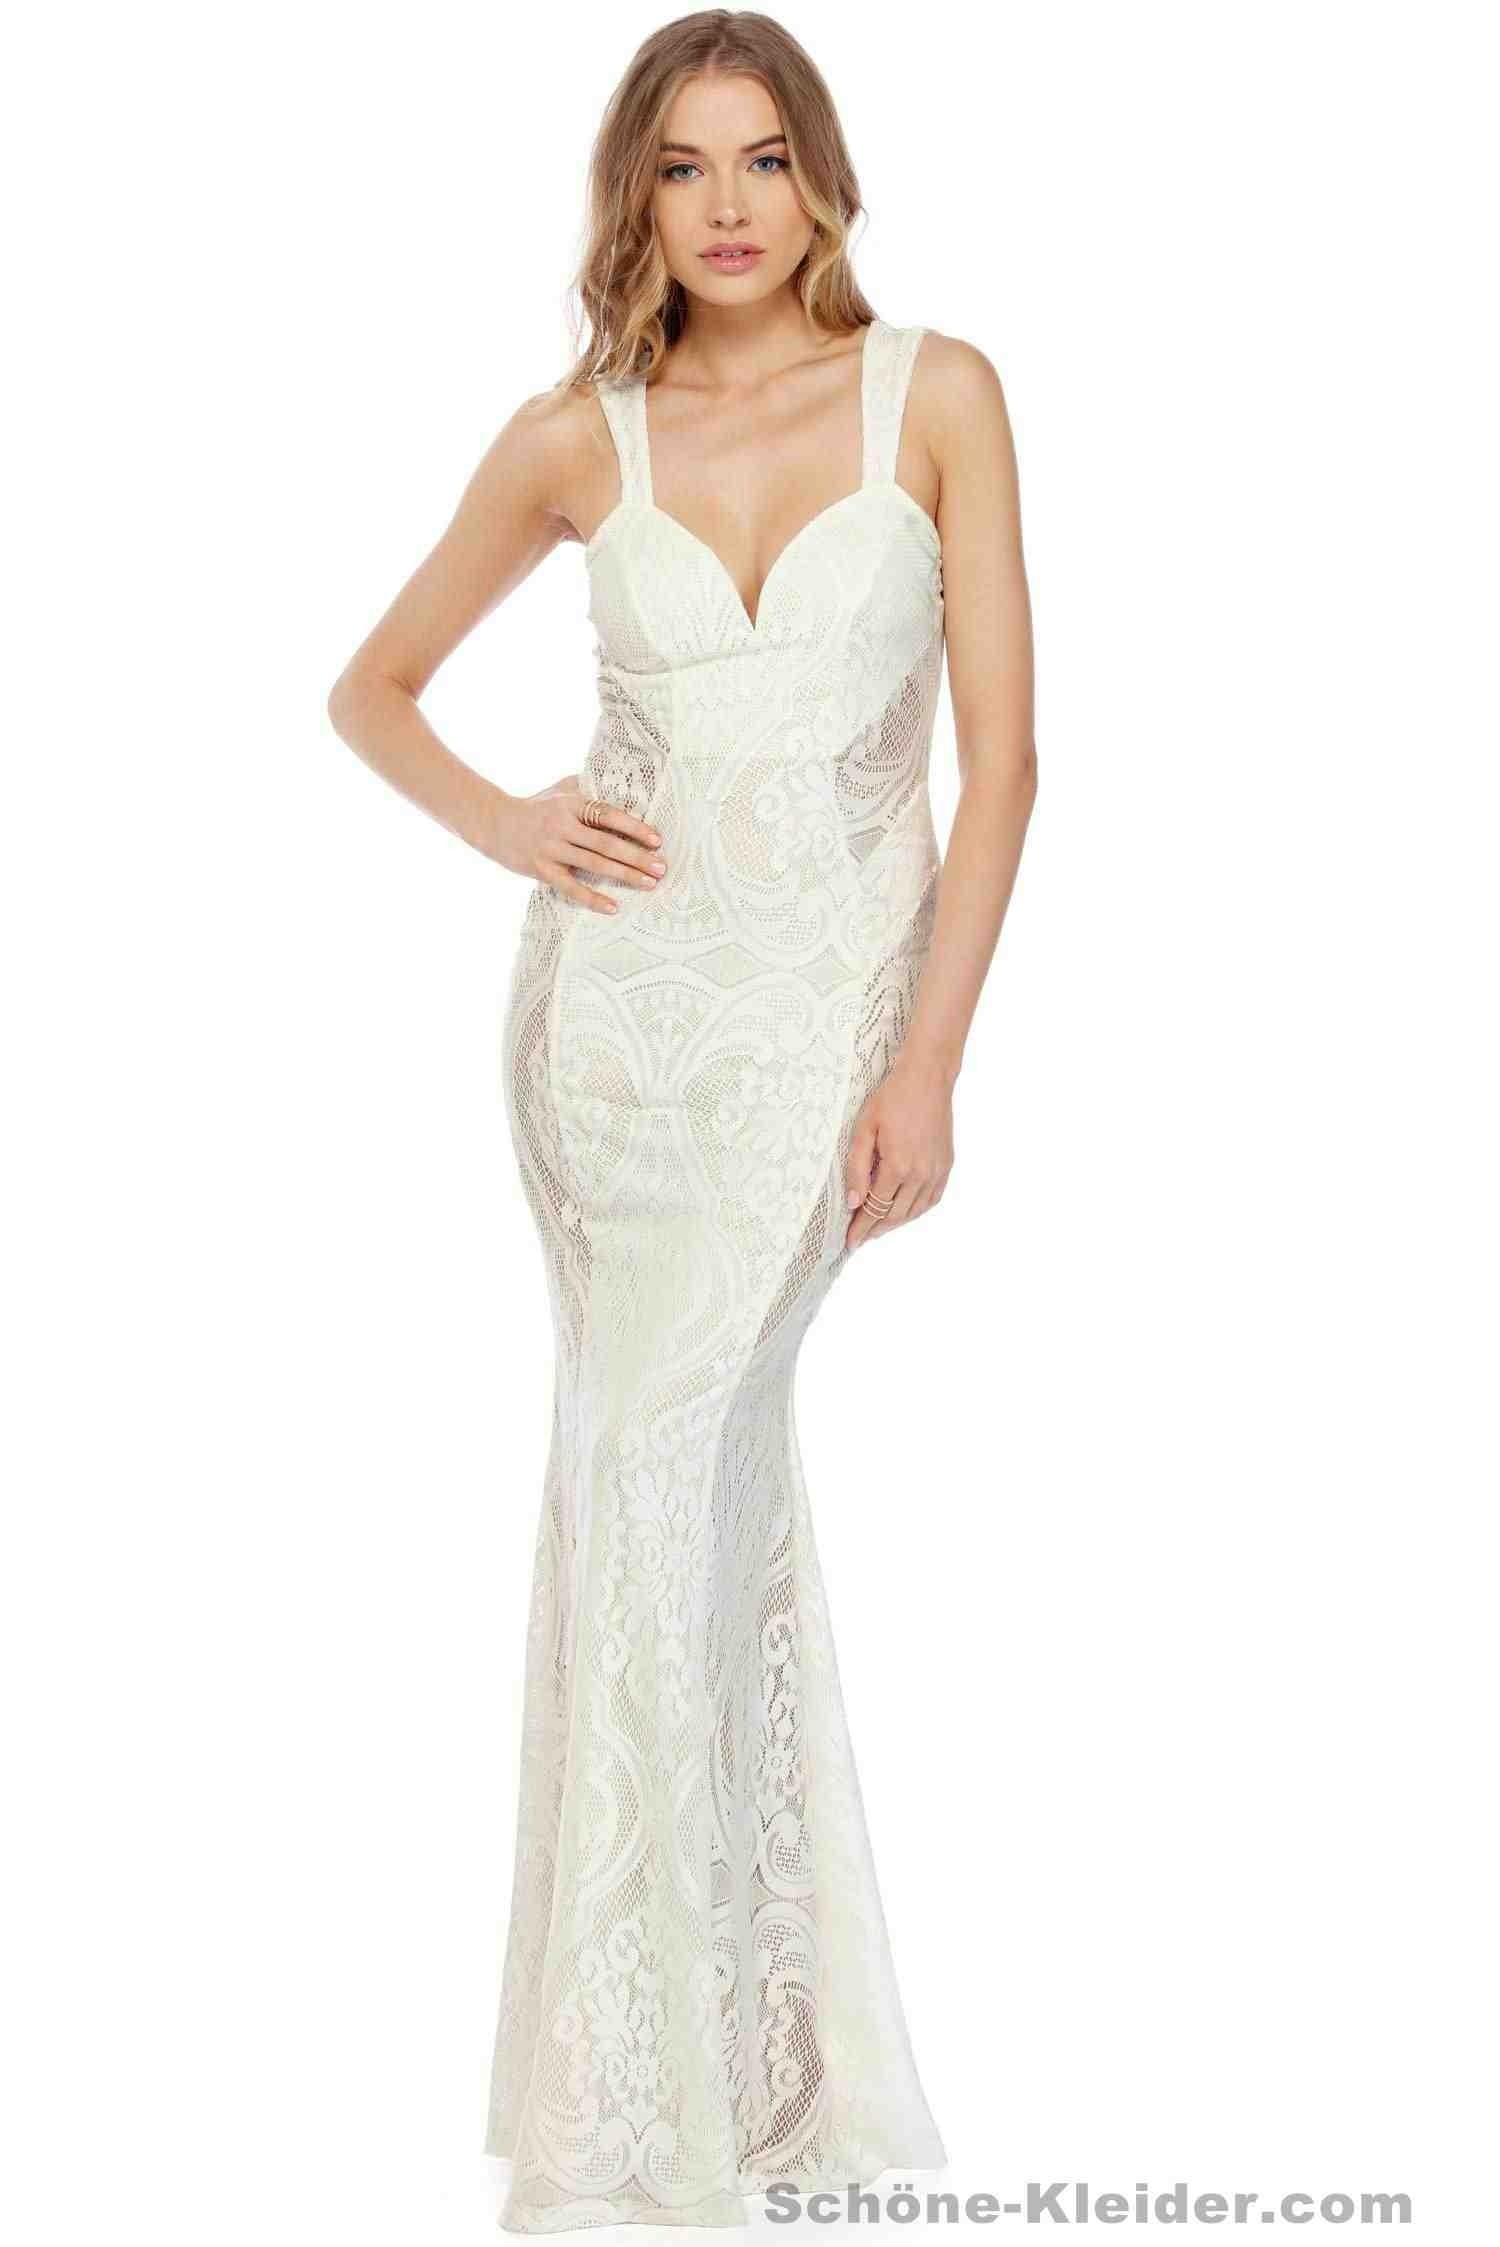 20 Top Kleid Lang Spitze für 2019Abend Großartig Kleid Lang Spitze Boutique